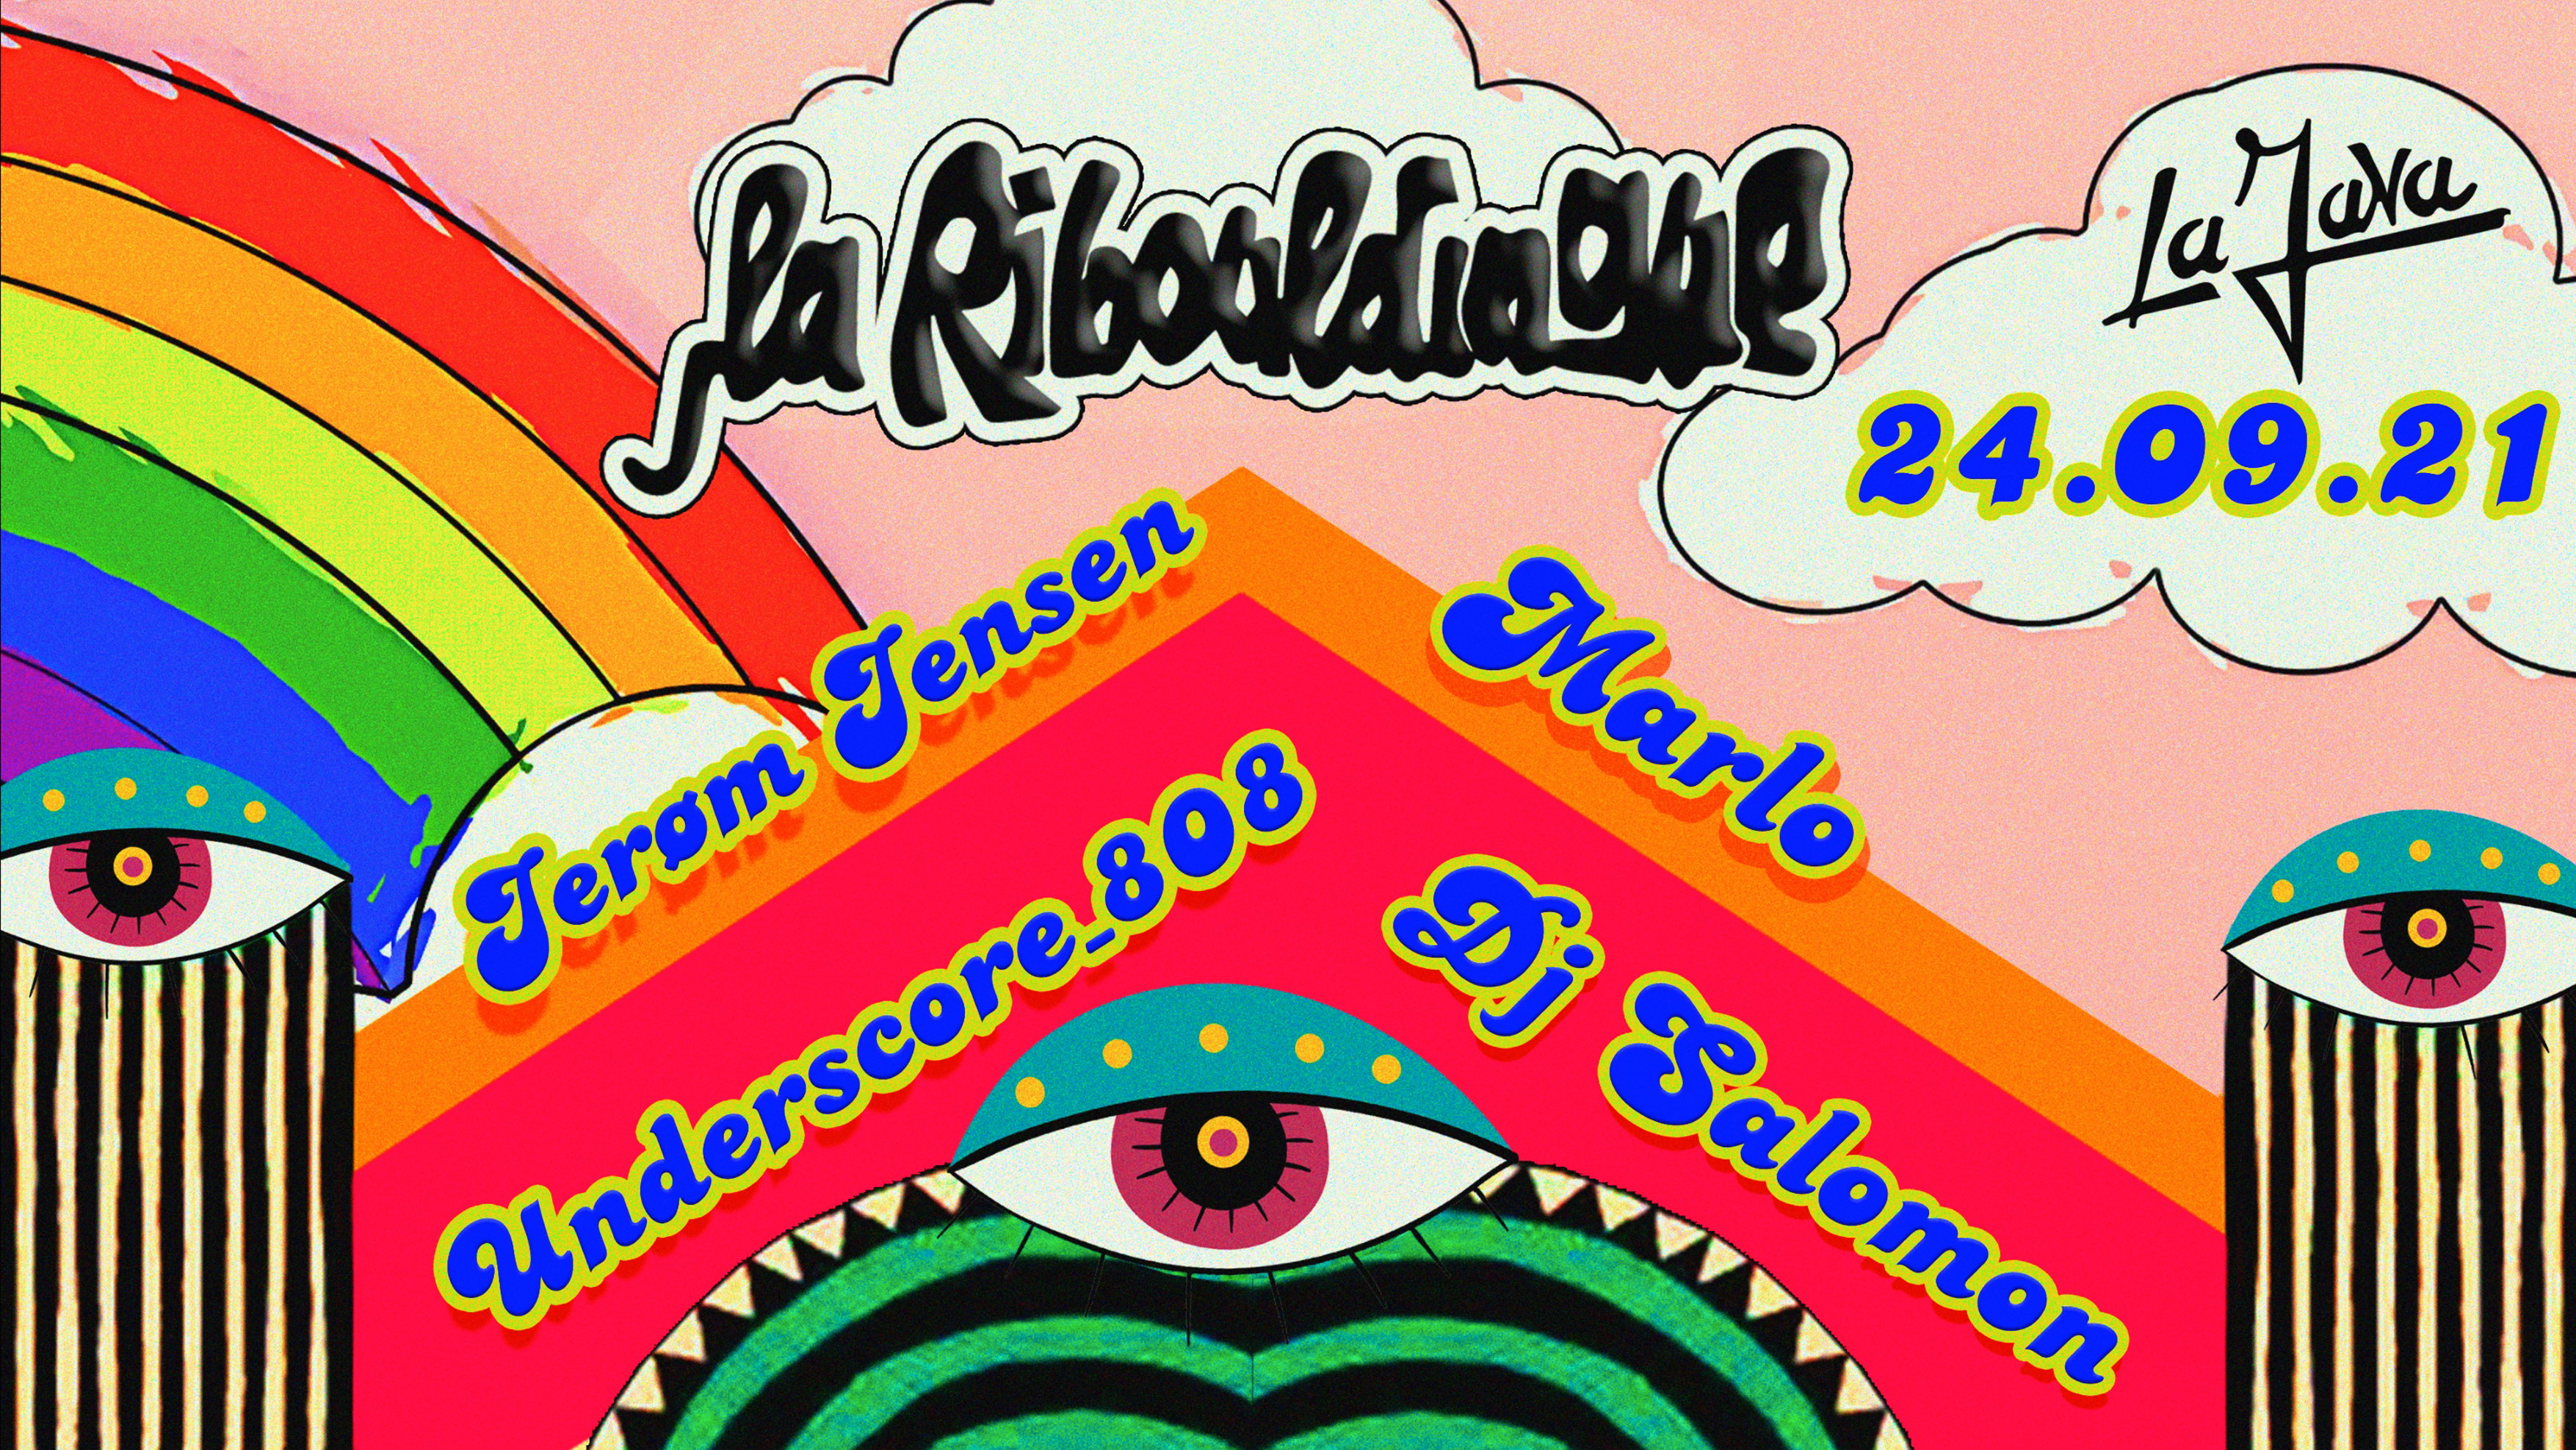 La Ribouldingue : Jerøm Jansen / Underscore_808 / DJ Salomon / Marlo